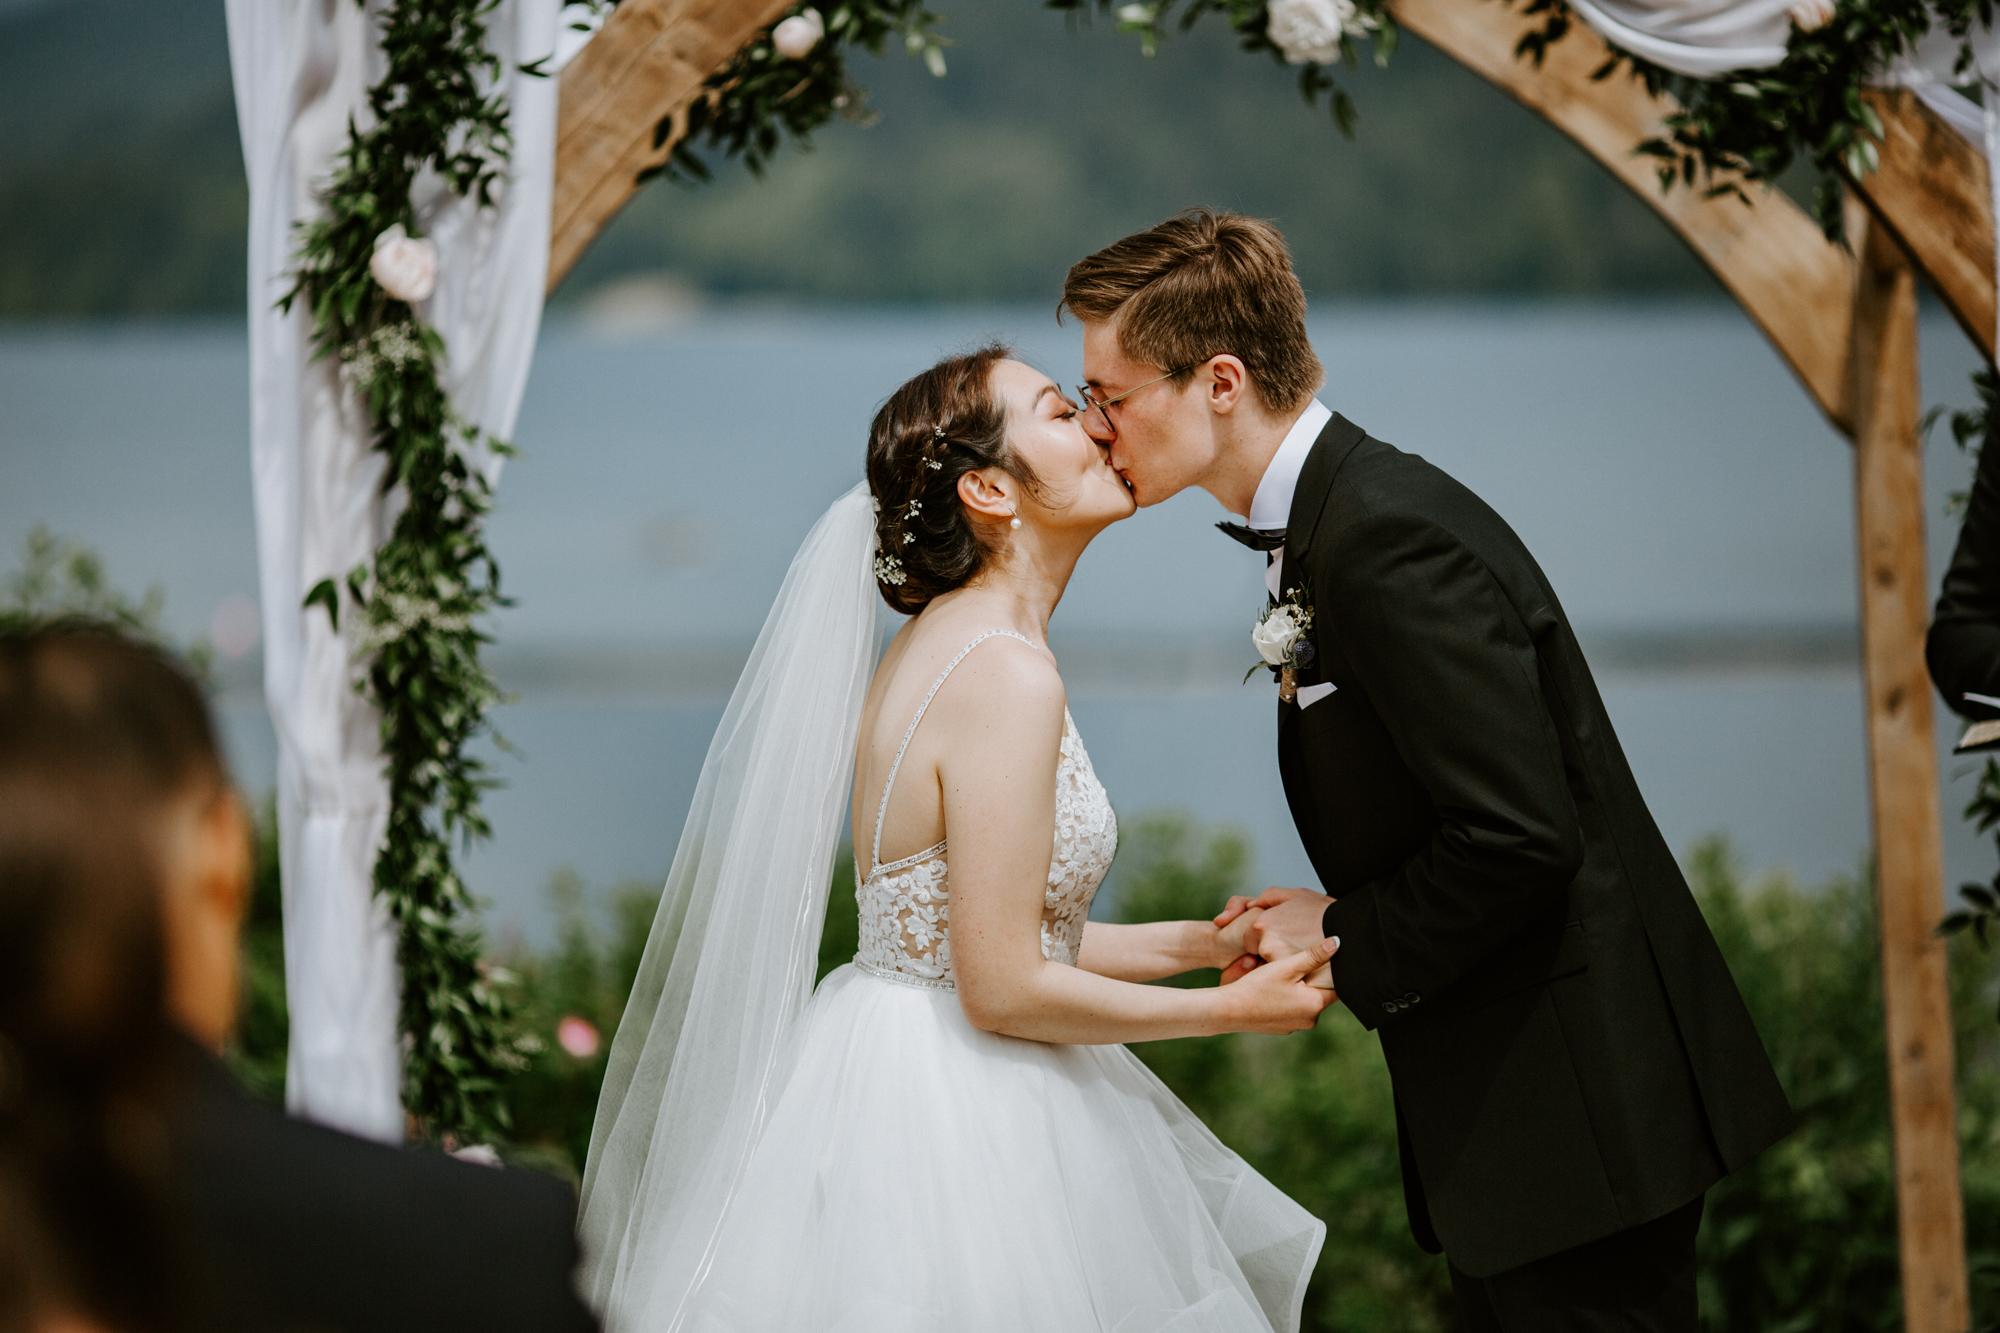 Yelim& Sorin- Wedding Day- HL-SD-206.JPG